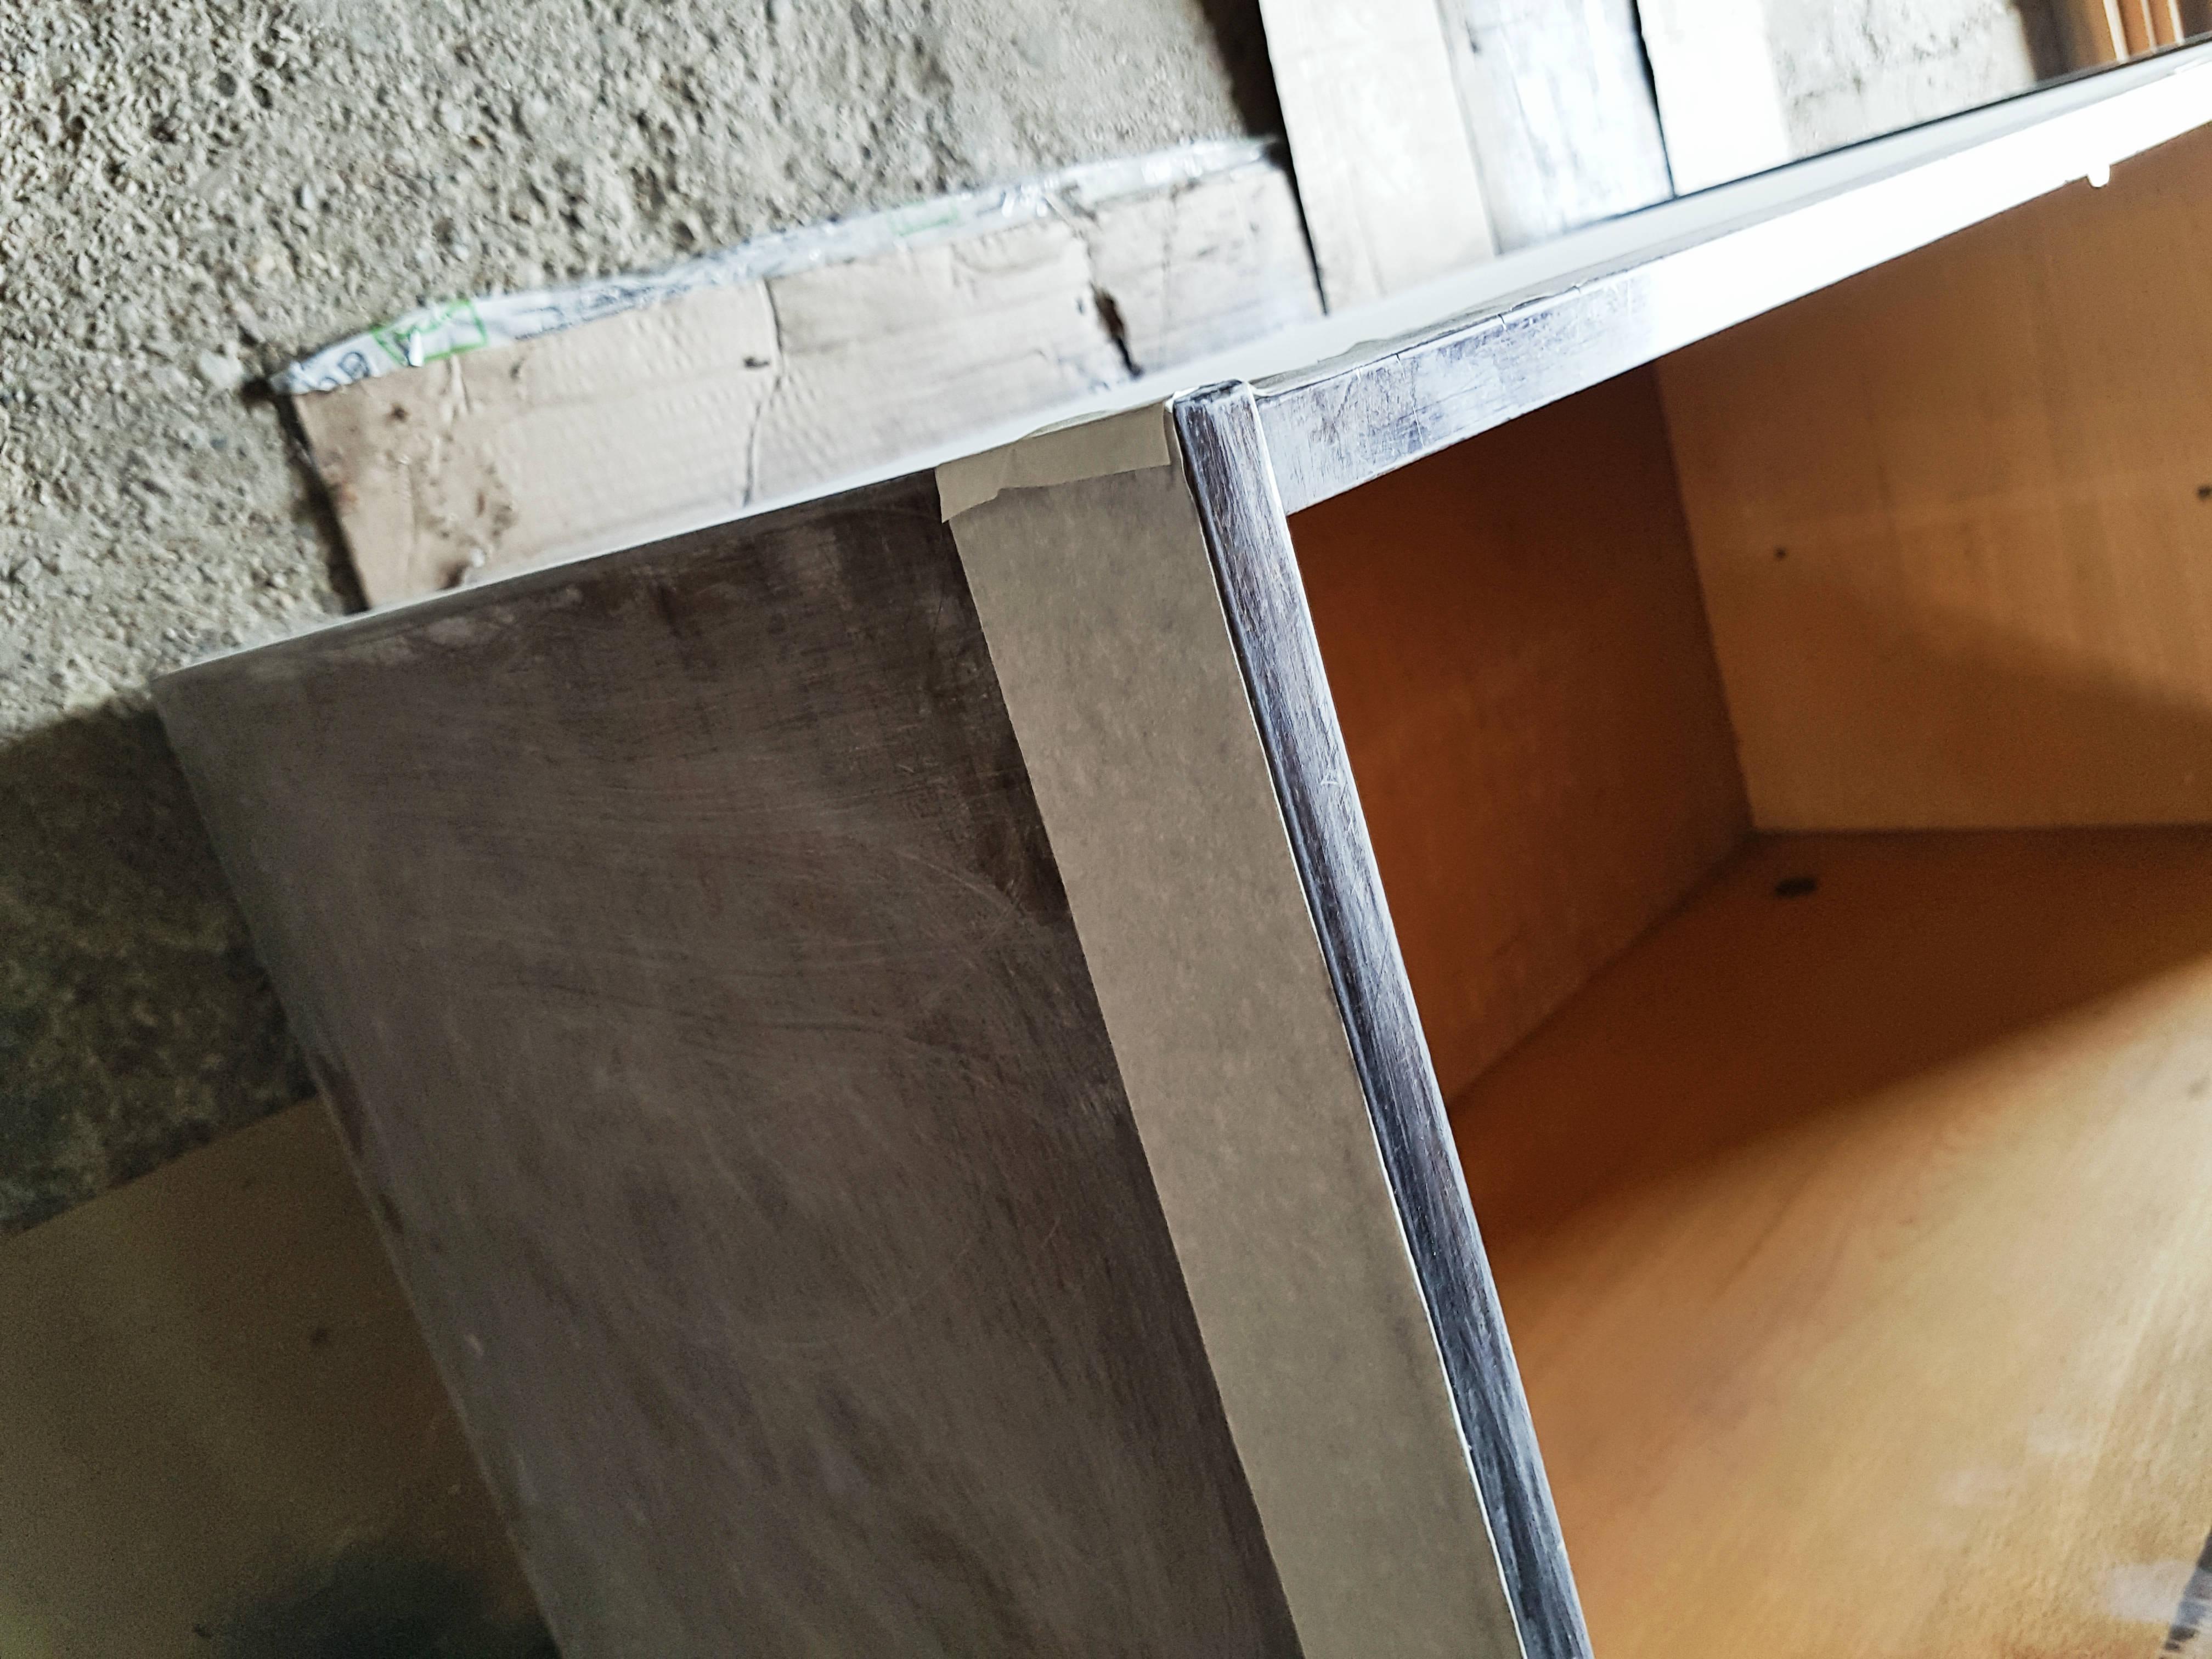 DIY szafka PRL - jak pomalować szafkę PRL